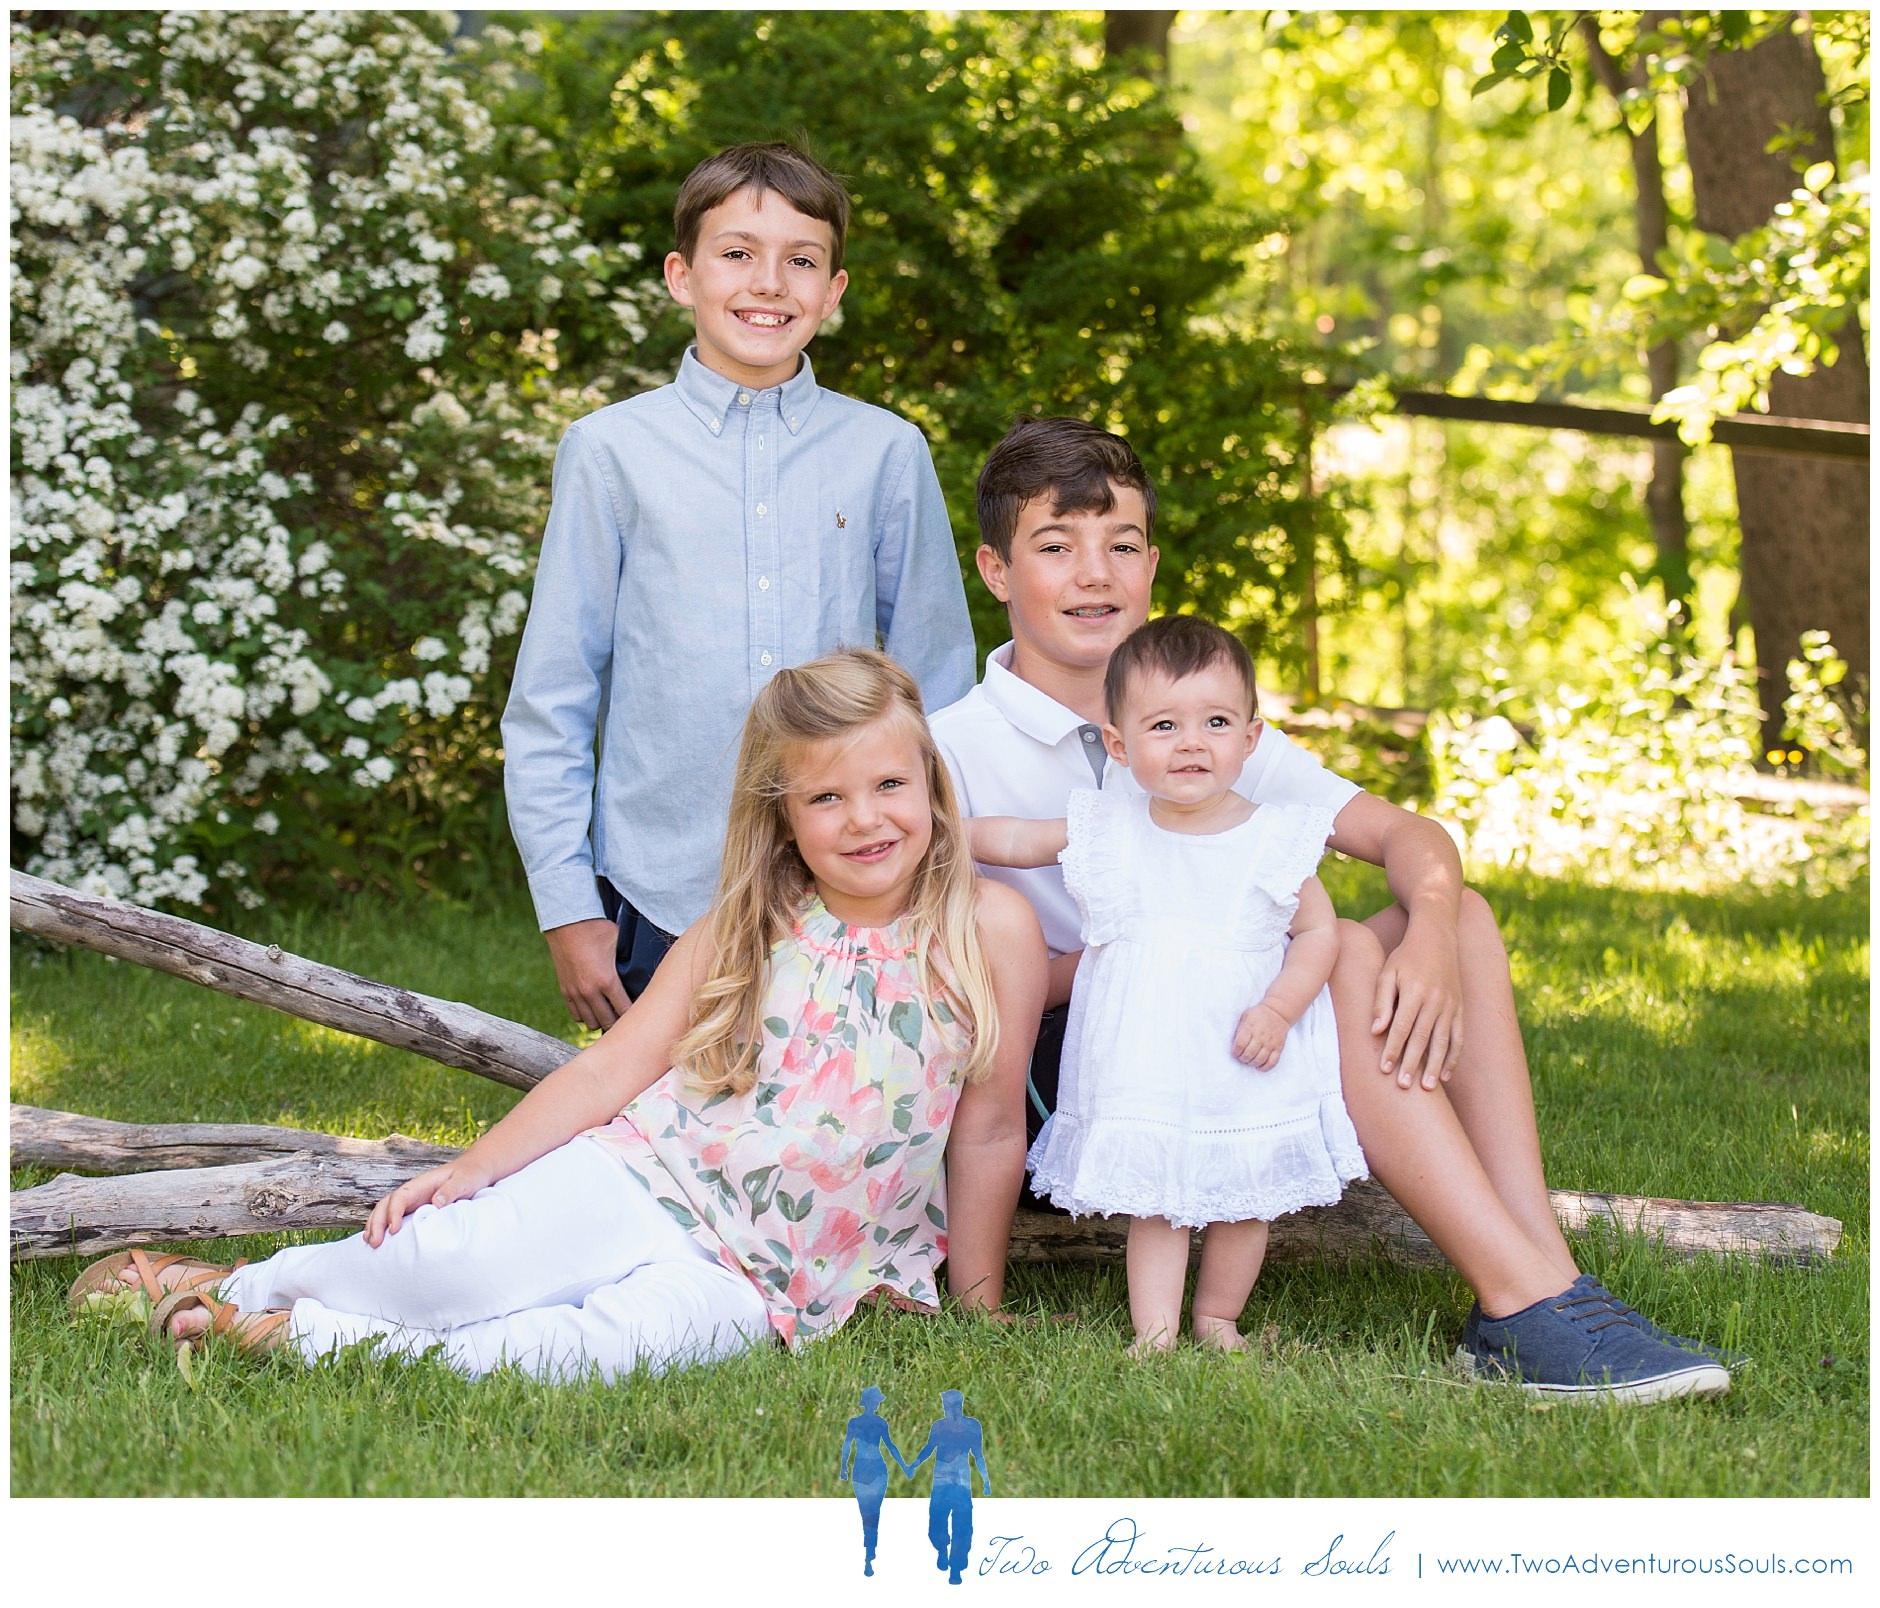 Rockport Family Photos, Maine Family Photographers, Two Adventurous Souls_0004.jpg